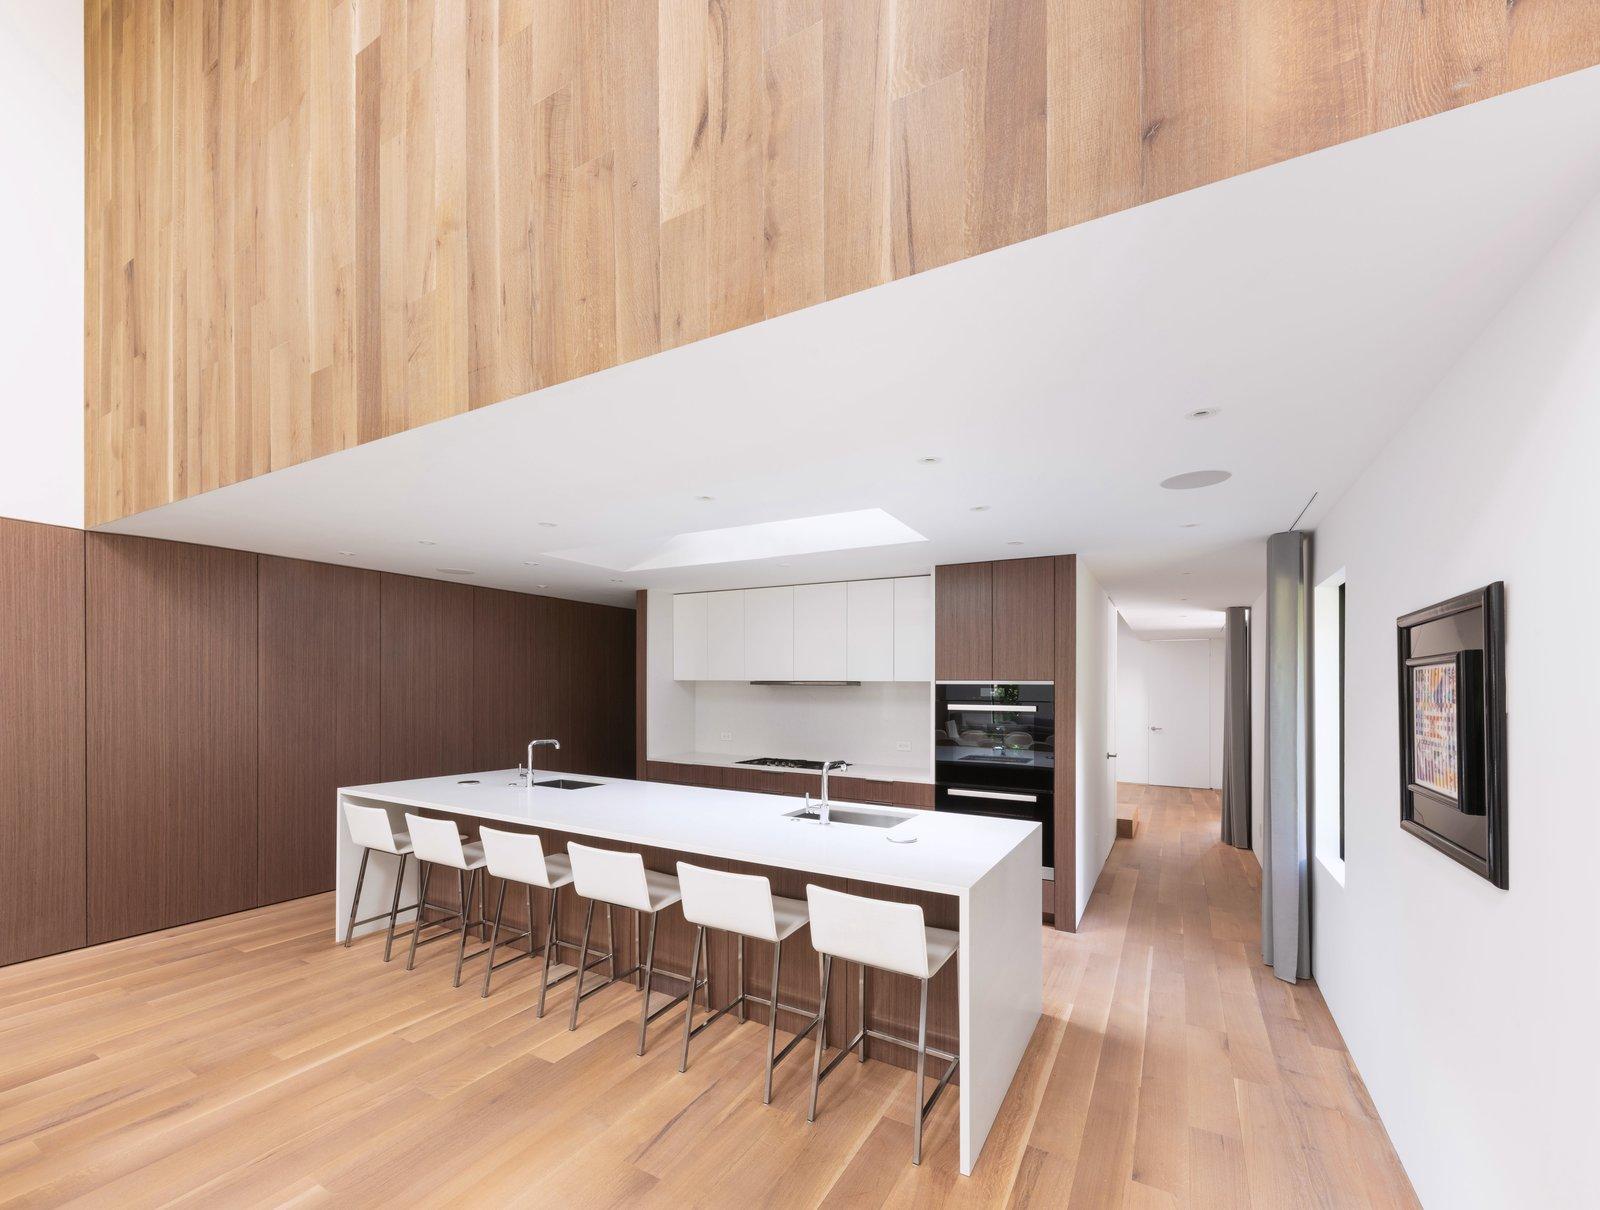 Kitchen, Undermount, Wall Oven, Recessed, Wood, Ceiling, Light Hardwood, and Engineered Quartz  Best Kitchen Wall Oven Wood Undermount Recessed Engineered Quartz Photos from Split Box House